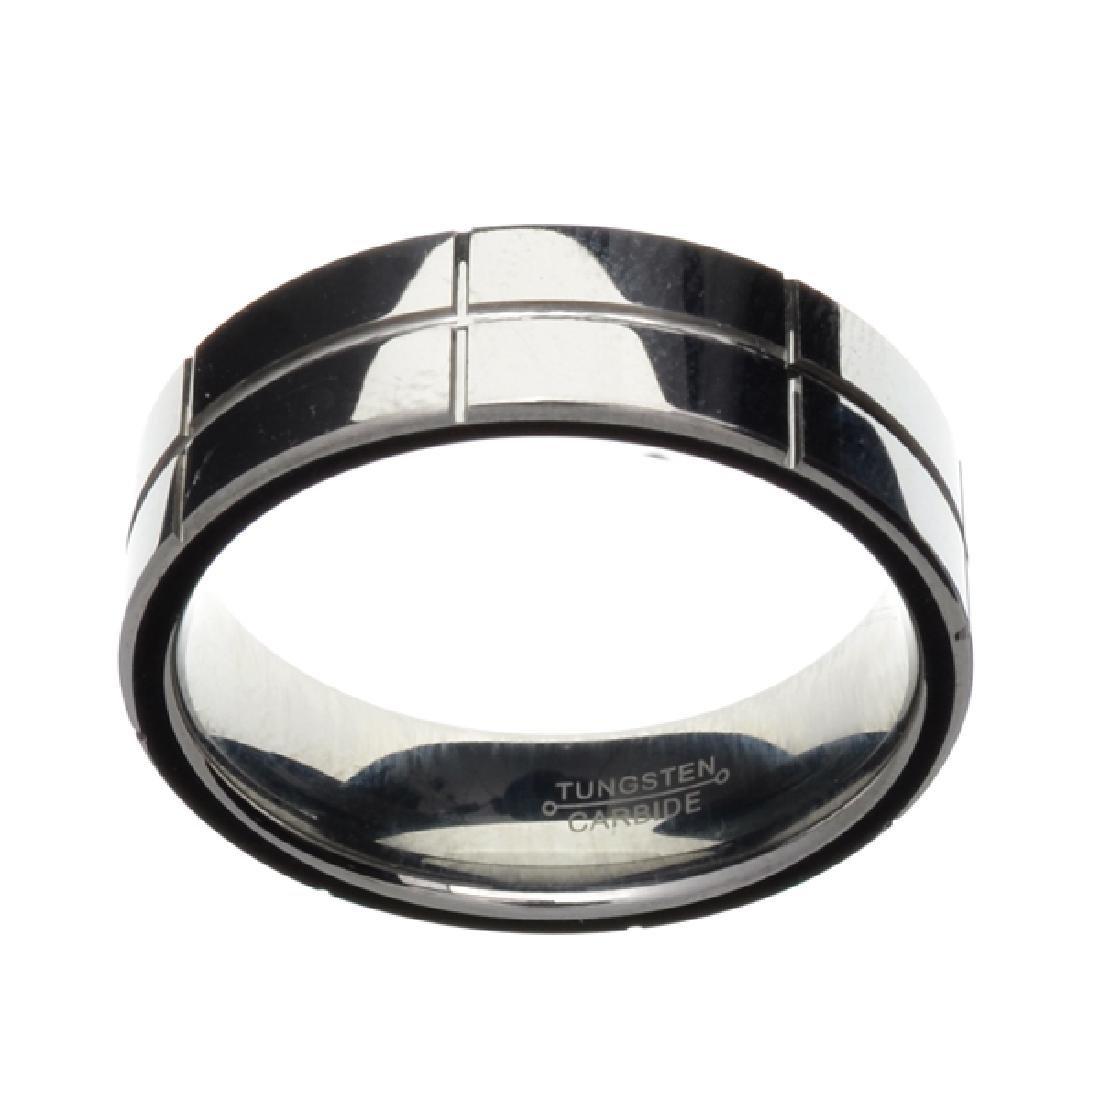 Rare Tungsten Size 14 Ring